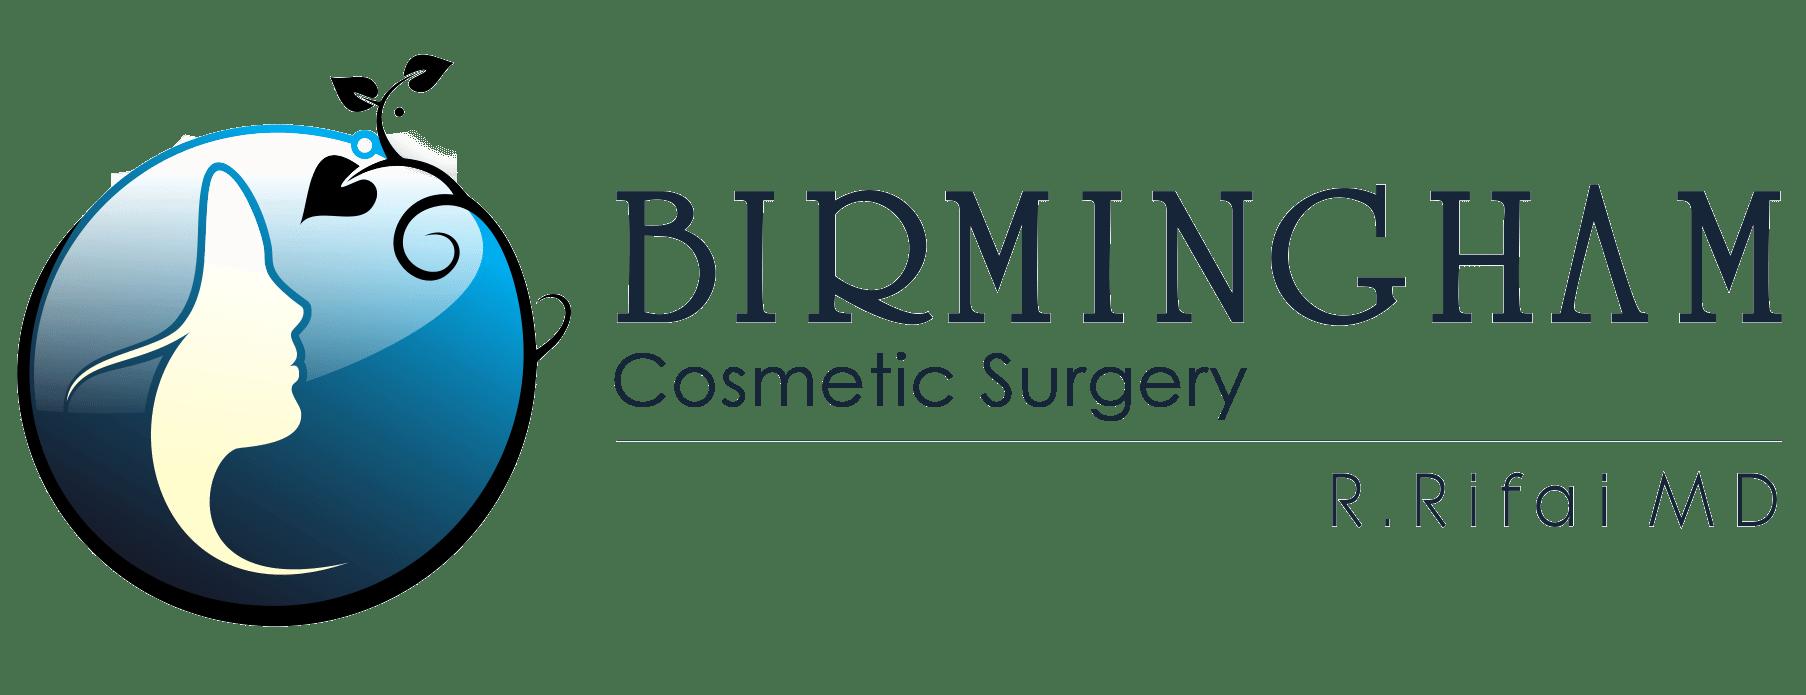 Birmingham Cosmetic Surgery